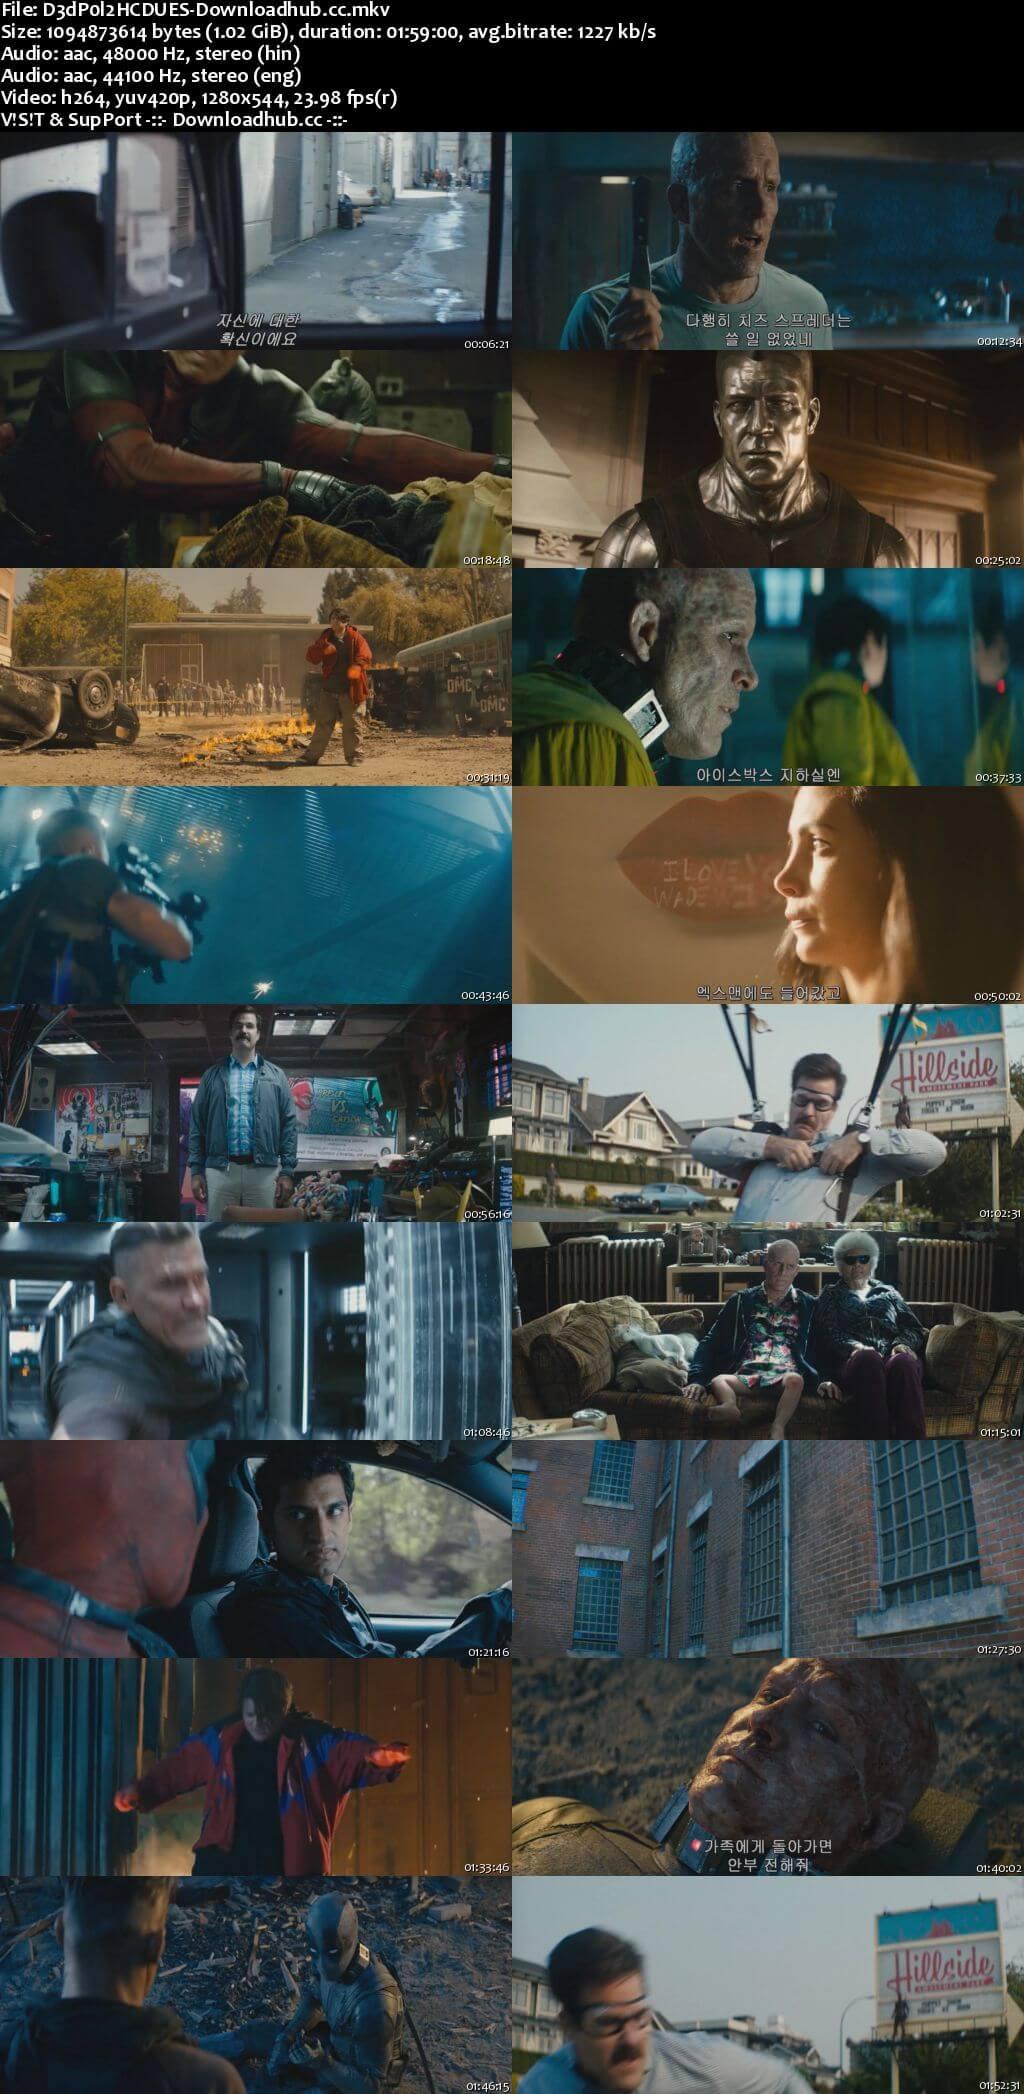 Deadpool 2 2018 Dual Audio 720p HC HDRip [Hindi (Cleaned) - English]